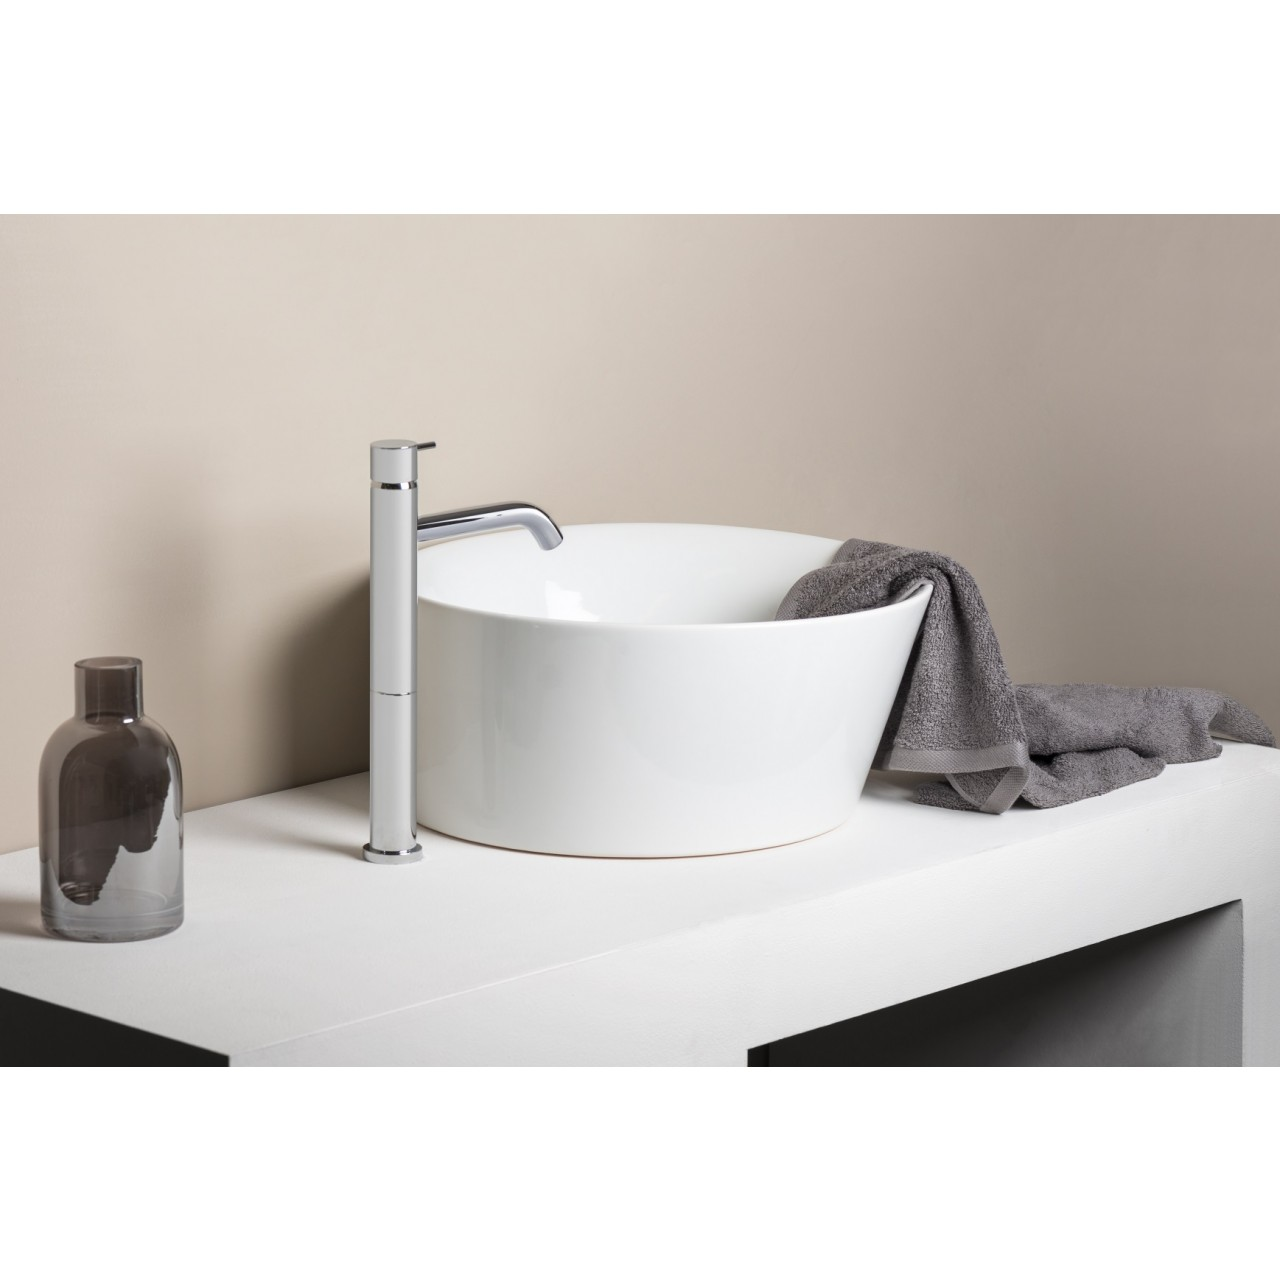 Diametro35Inox - Exposed Single Lever Basin Mixer